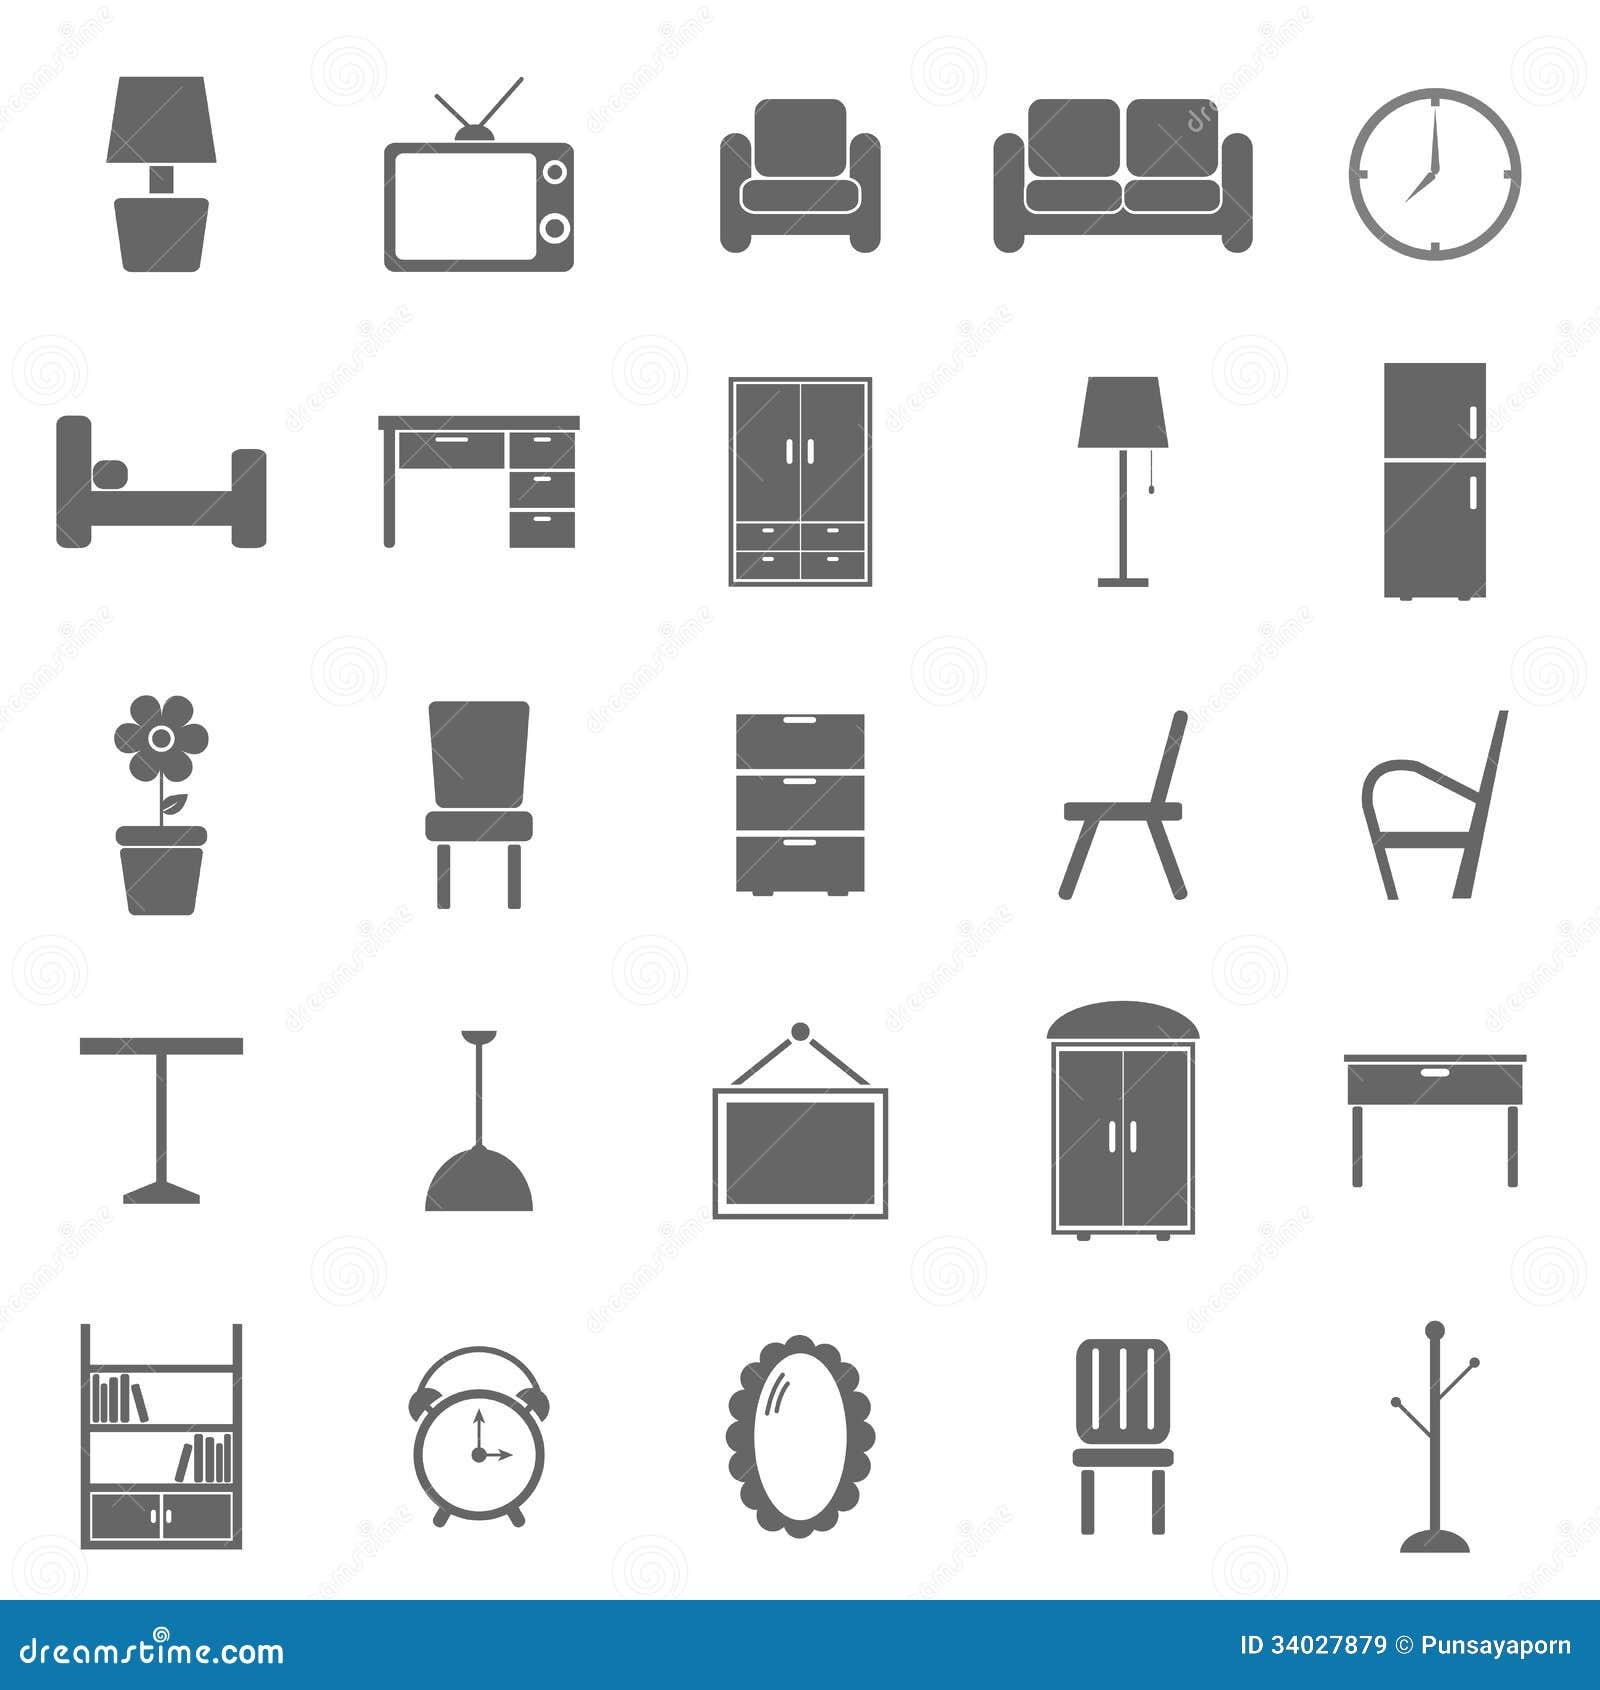 Furniture Icons On White Background Royalty Free Stock Images Image 34027879